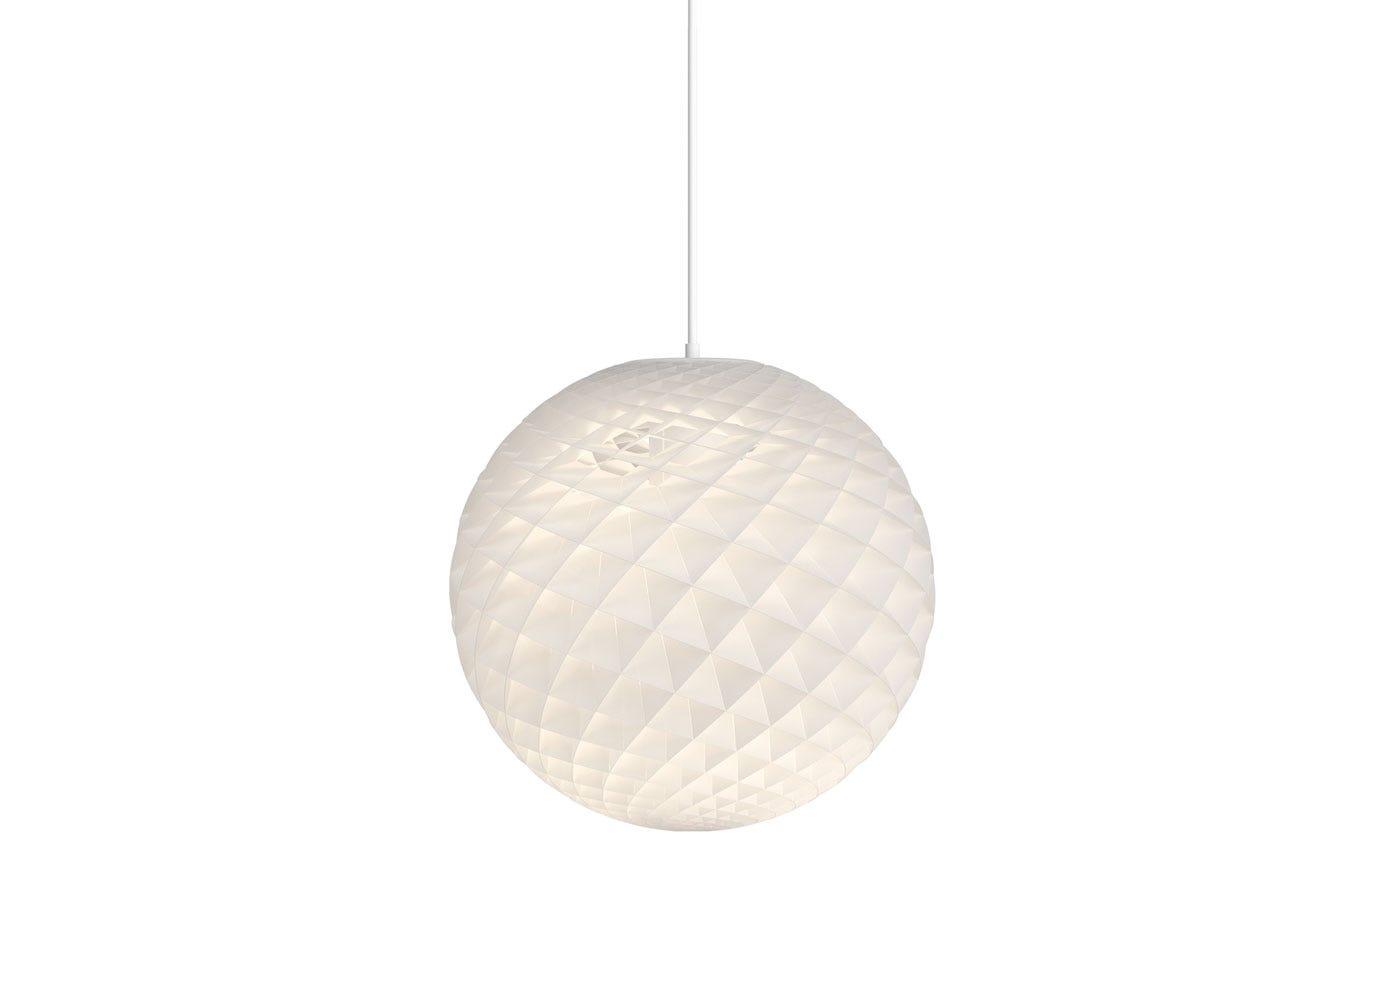 Patera Pendant Light White Dia 45cm